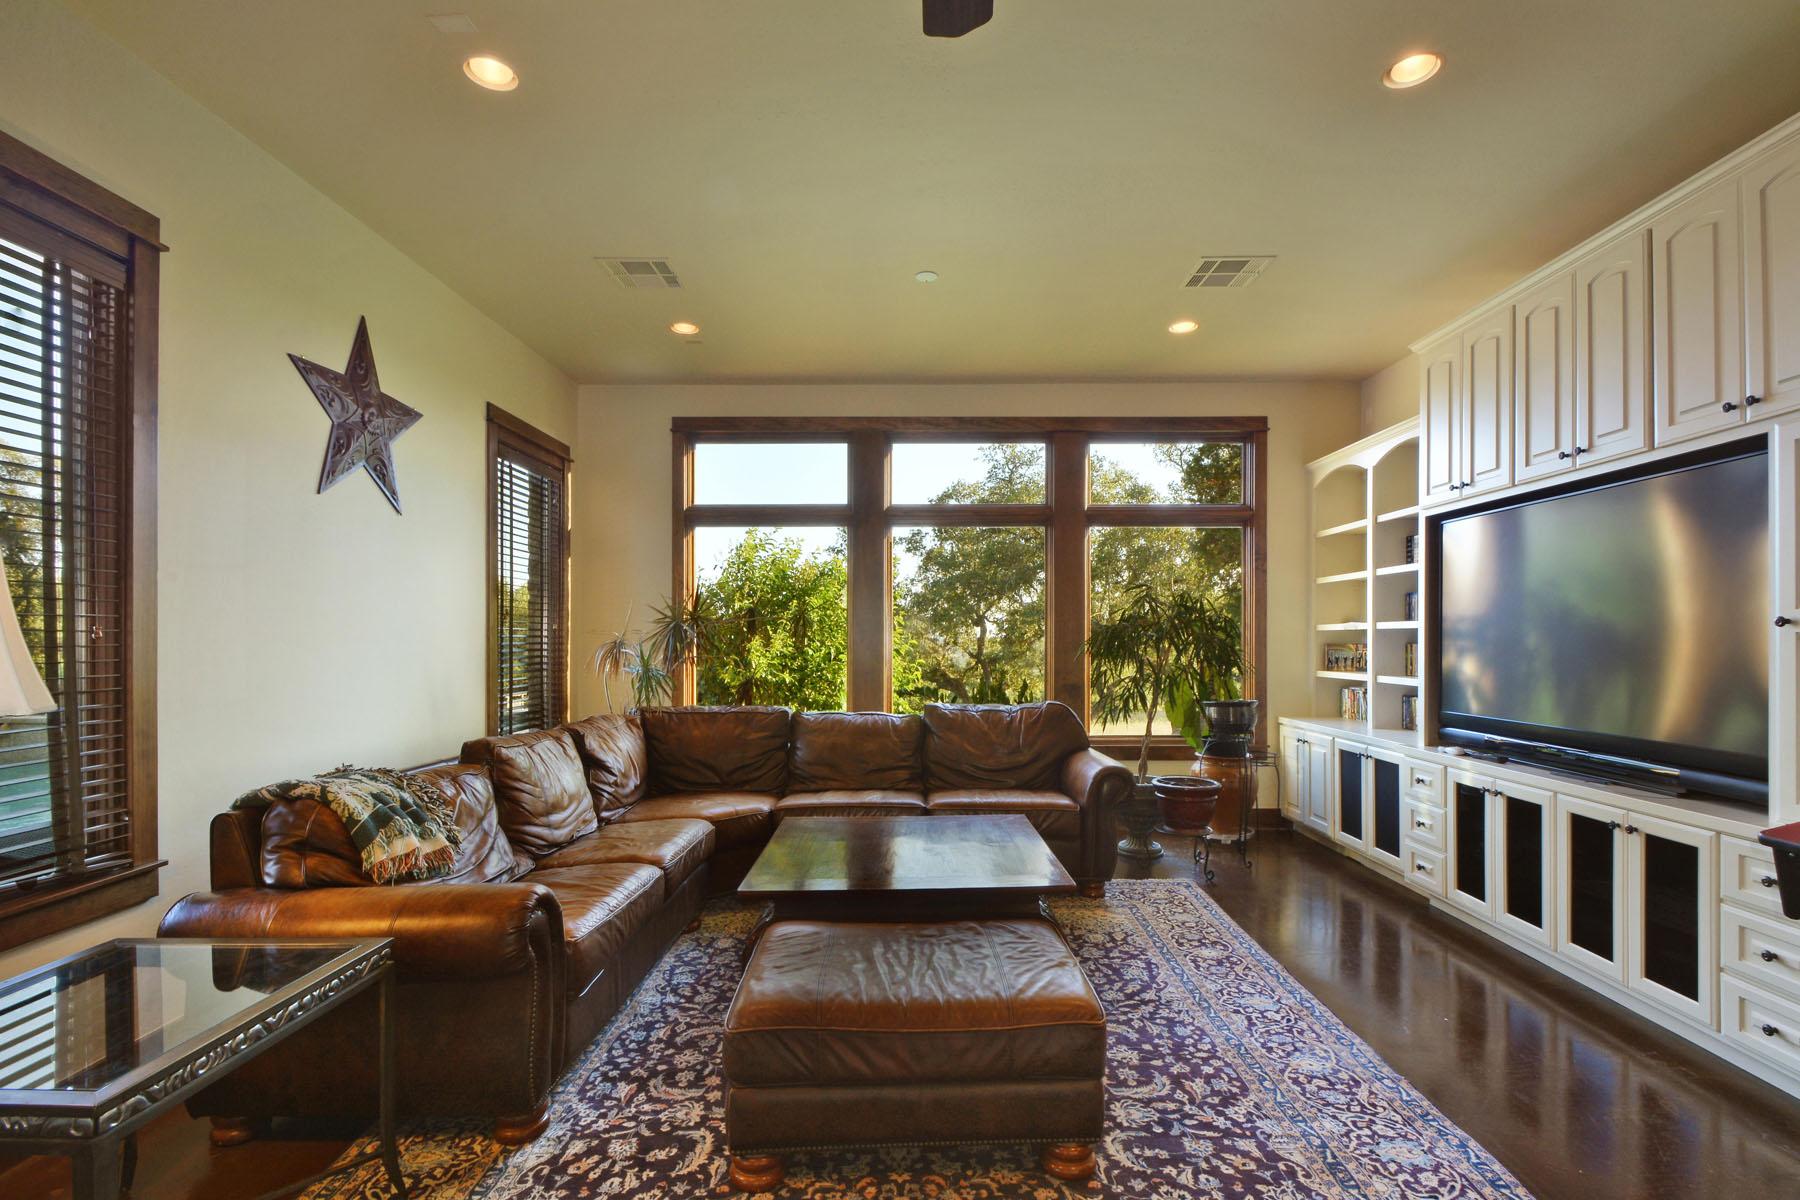 Additional photo for property listing at Fabulous Views and Privacy 8041 Carlton Ridge Cv Austin, Texas 78738 Estados Unidos